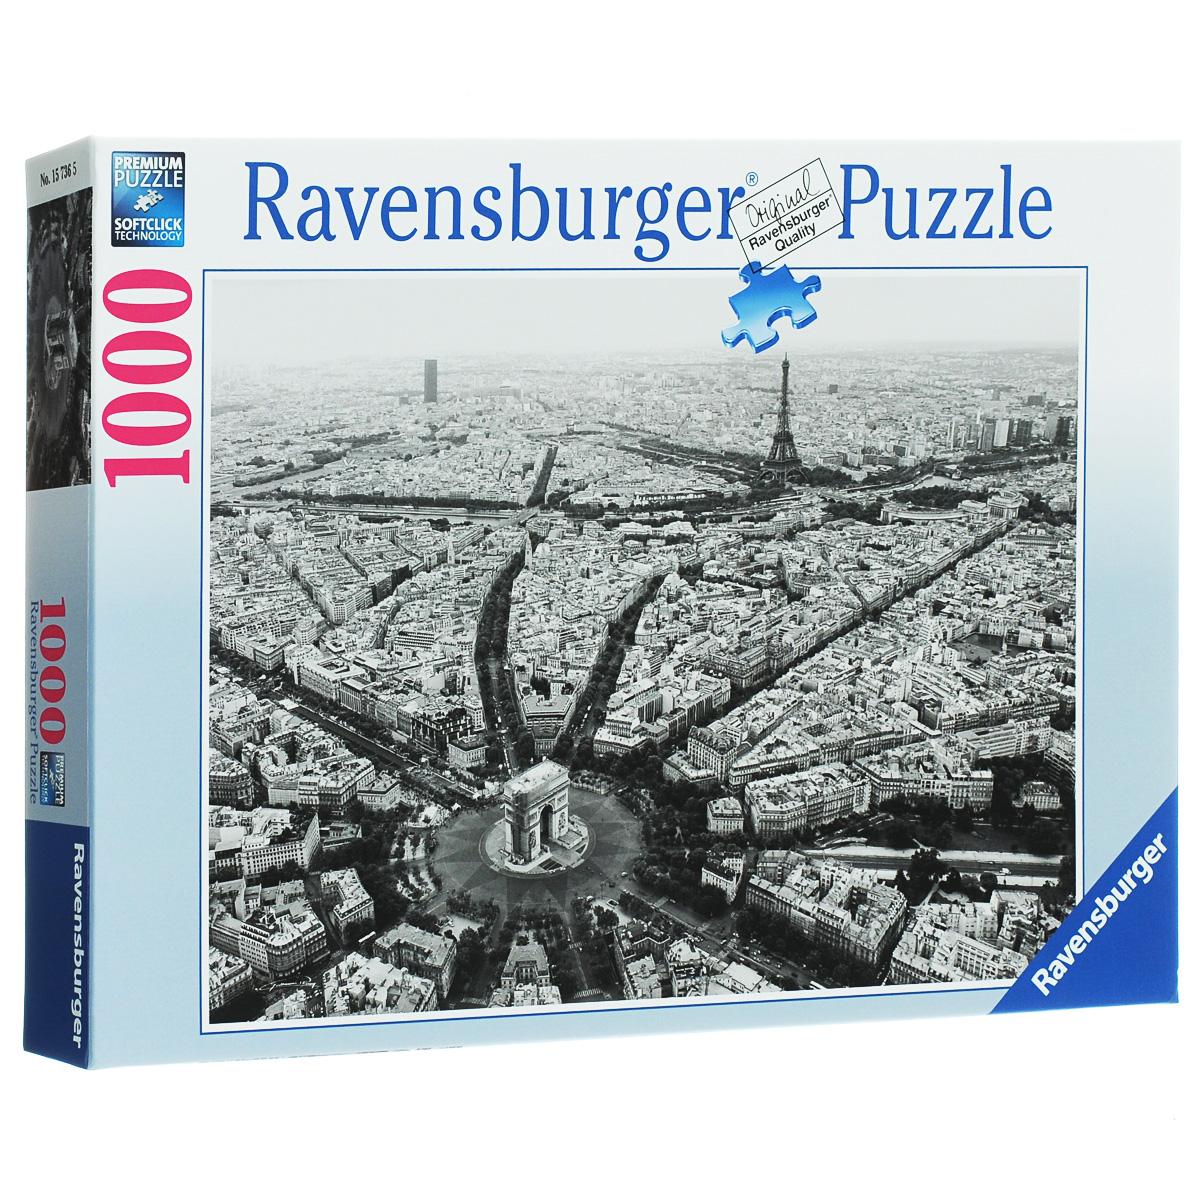 Ravensburger Черно-белый Париж. Пазл, 1000 элементов